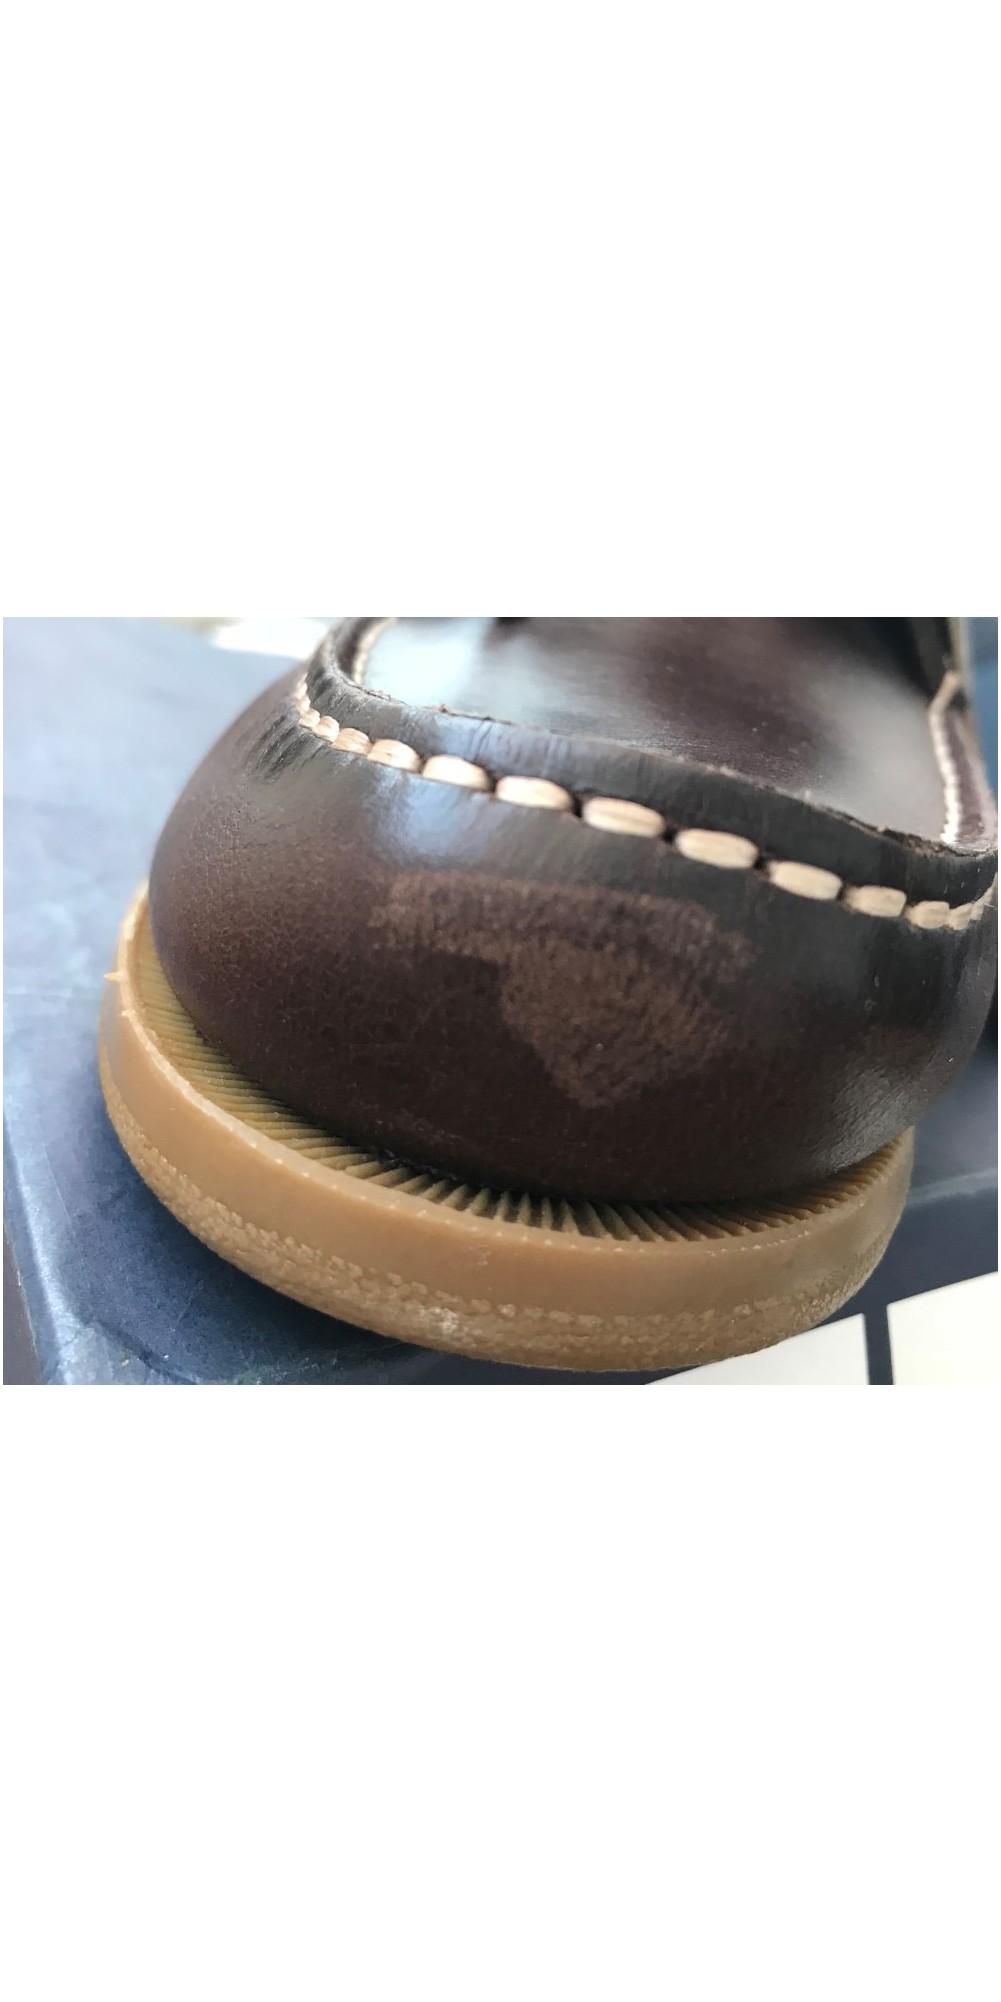 faab516b48e4 2019 Henri Lloyd Arkansa Deck Shoe CYCLONE Seafox   Caramel F94412 2ND ...